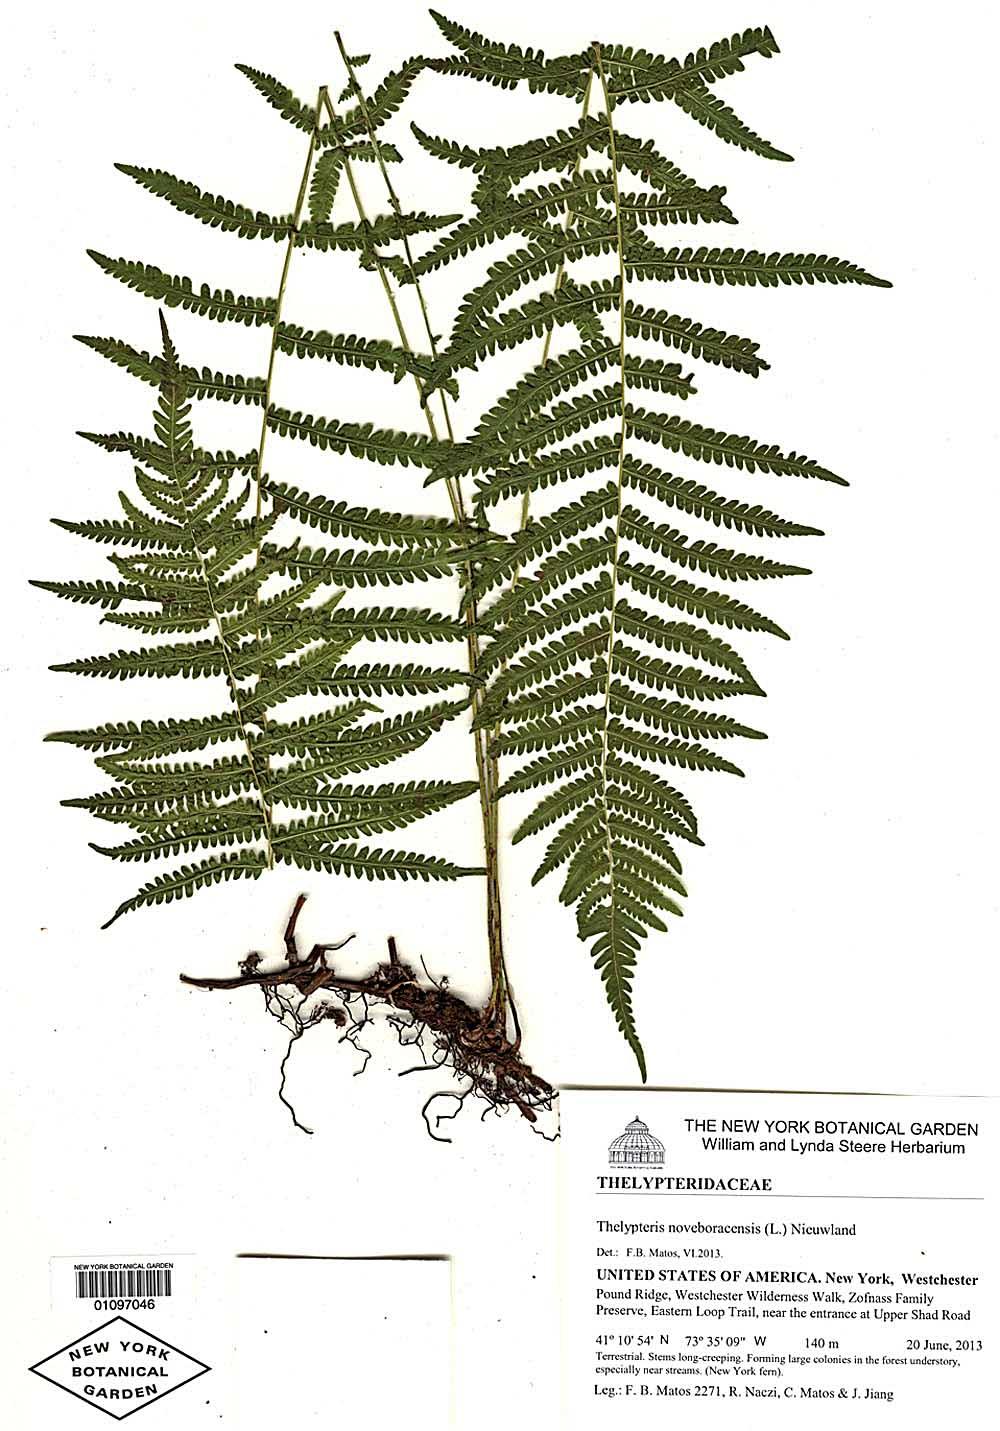 Thelypteris noveboracensis (syn. Asplenium noveboracensis) (New York fern), New York Botanical Garden Herbarium